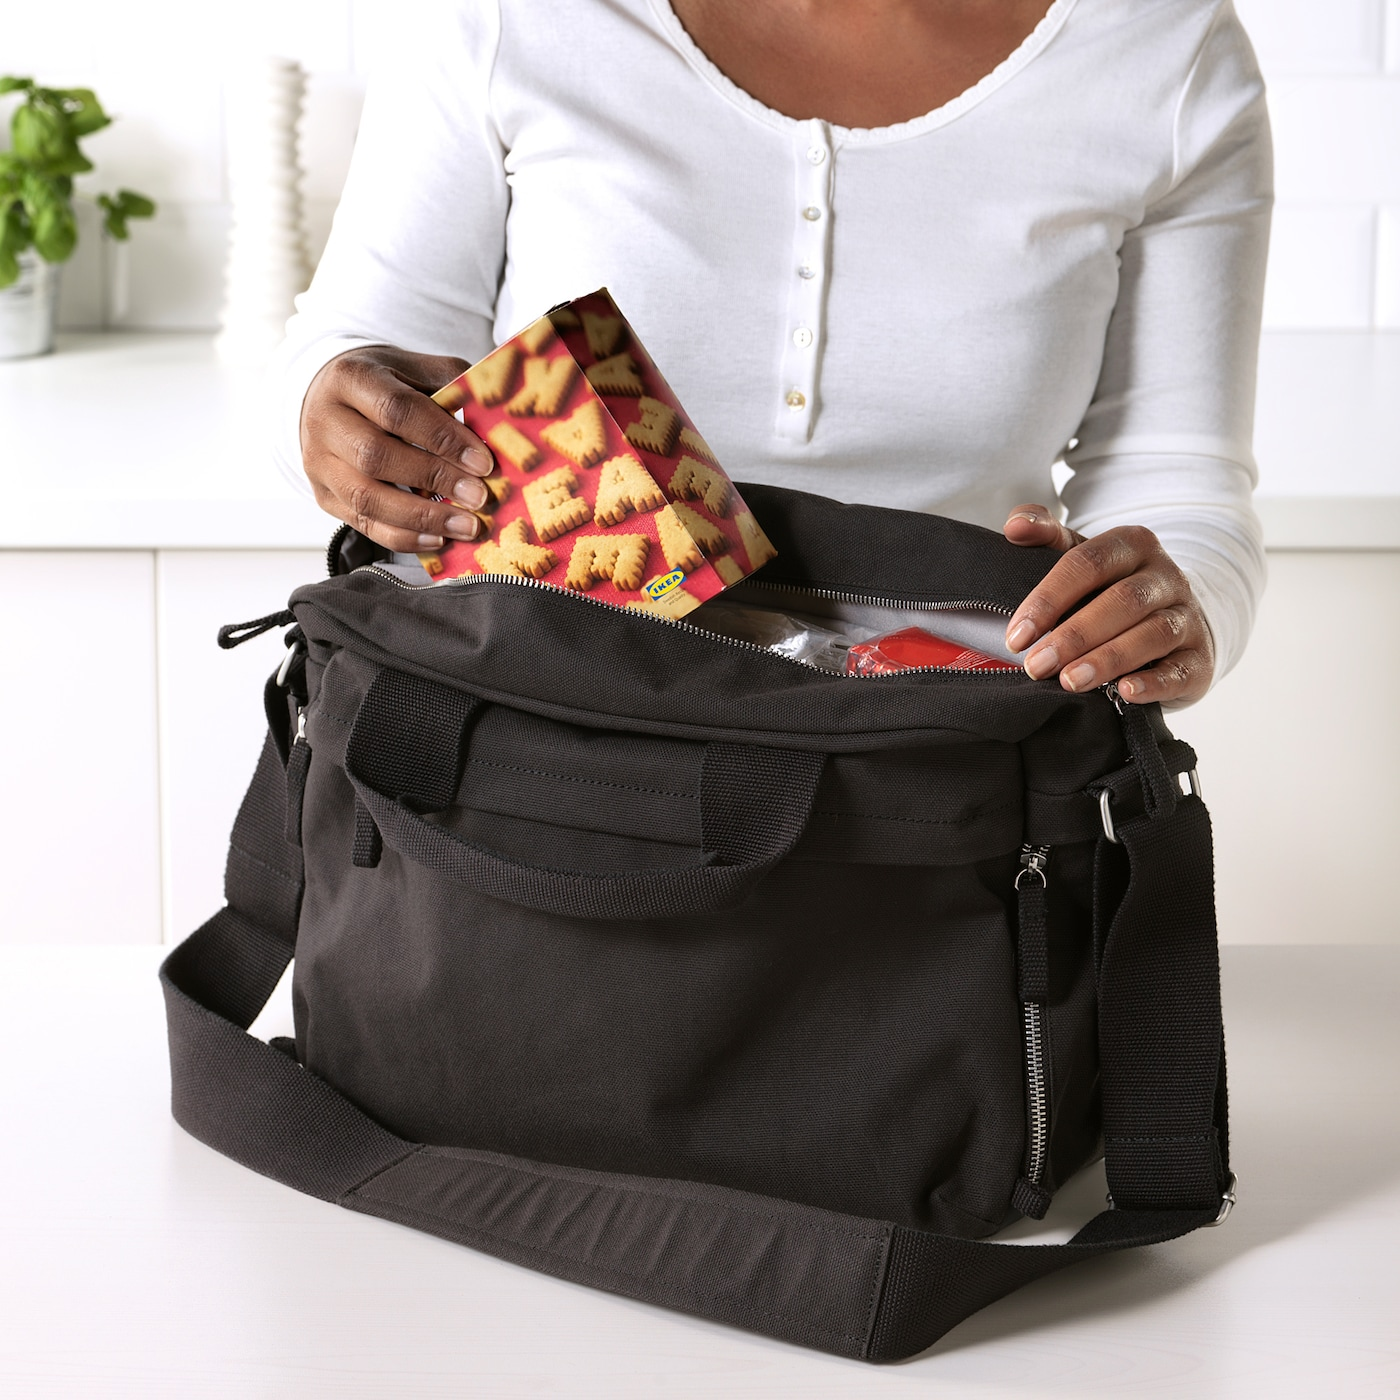 /Notebook Carrying Case IKEA F/örfina Laptop Sleeve/